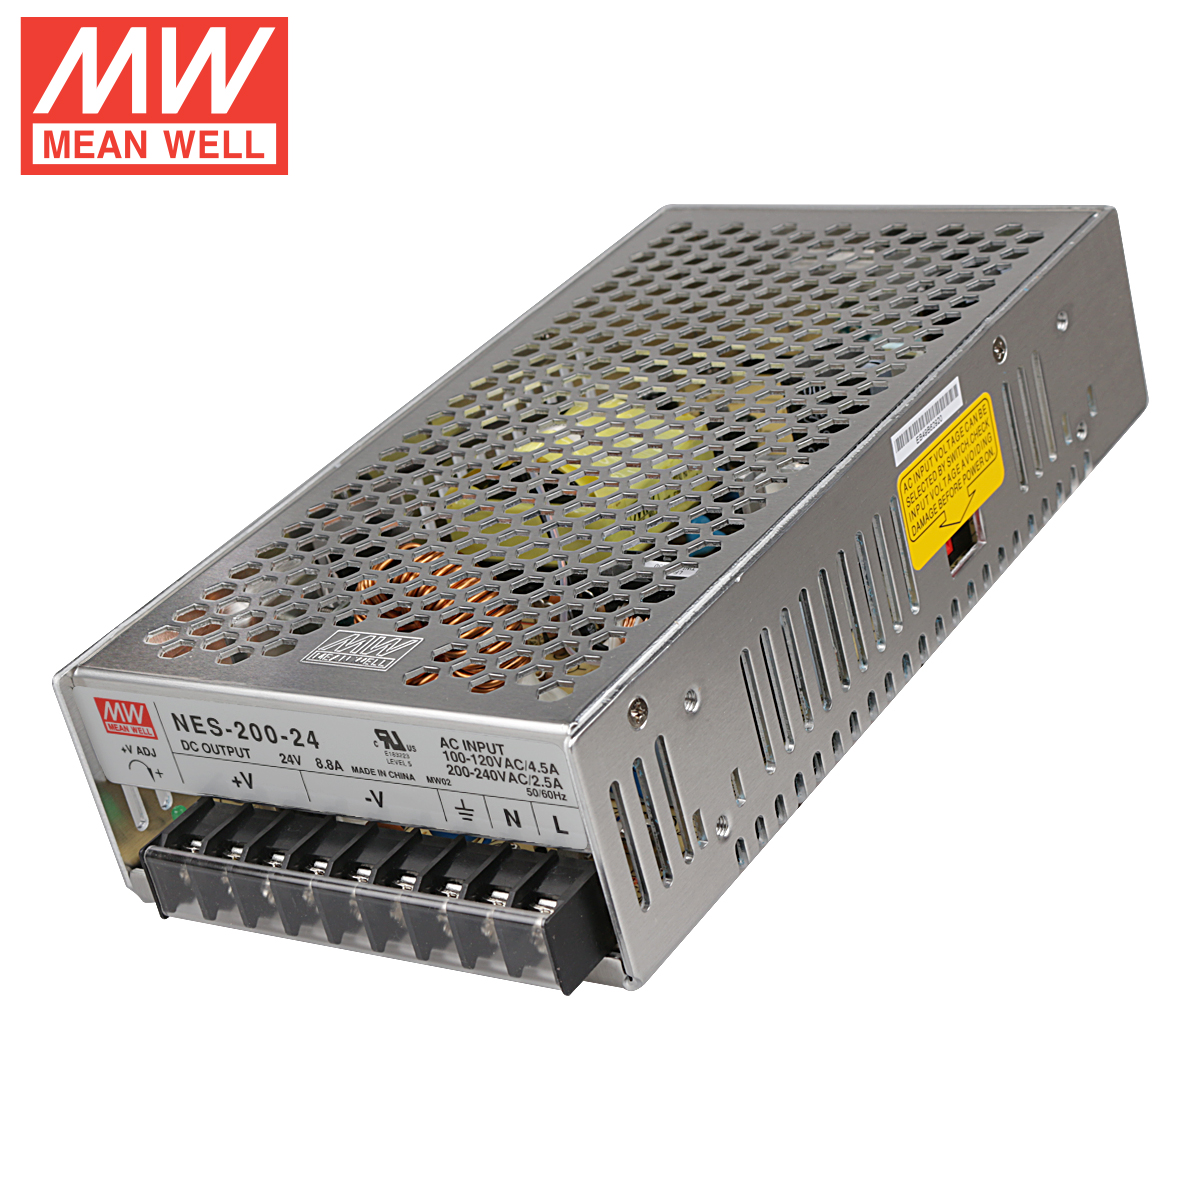 NES-200-24 200W24V8.8A πραγματική παροχή ενέργειας στην Ταϊβάν γουέι.